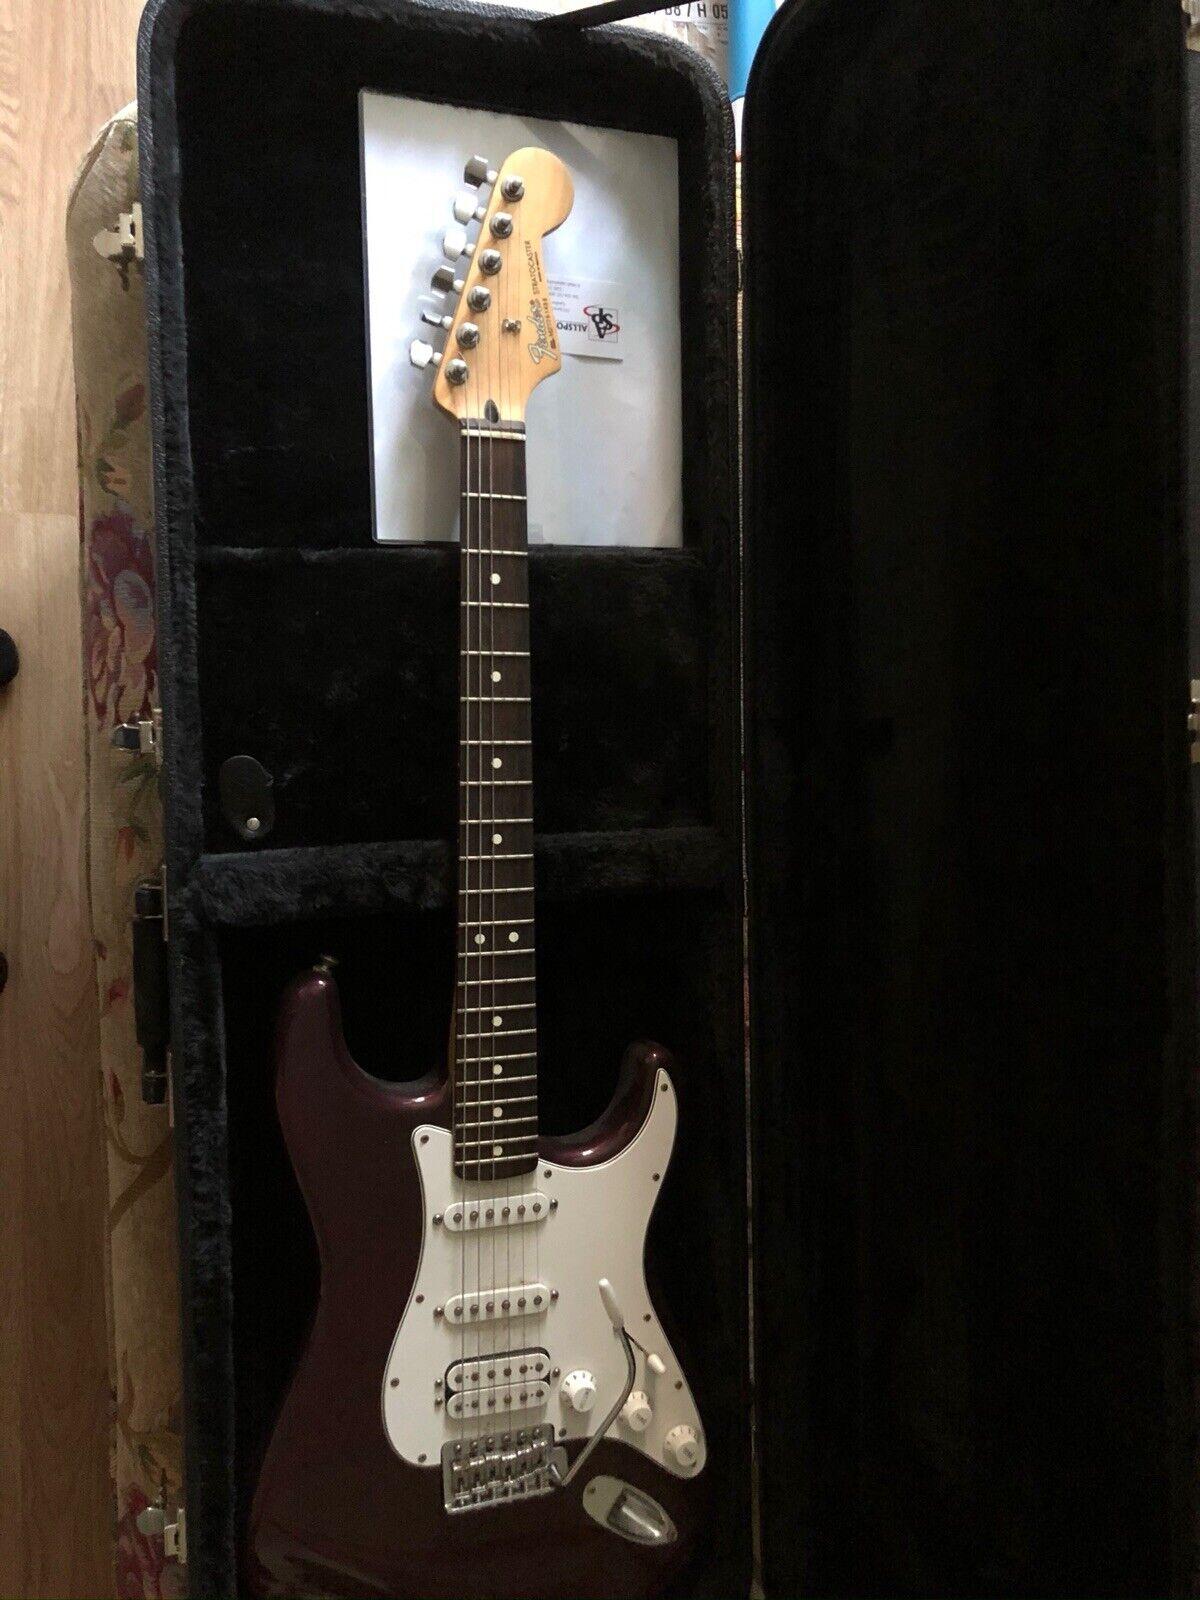 Fender Stratocaster Mexico Burgundy with Fender Hard Case